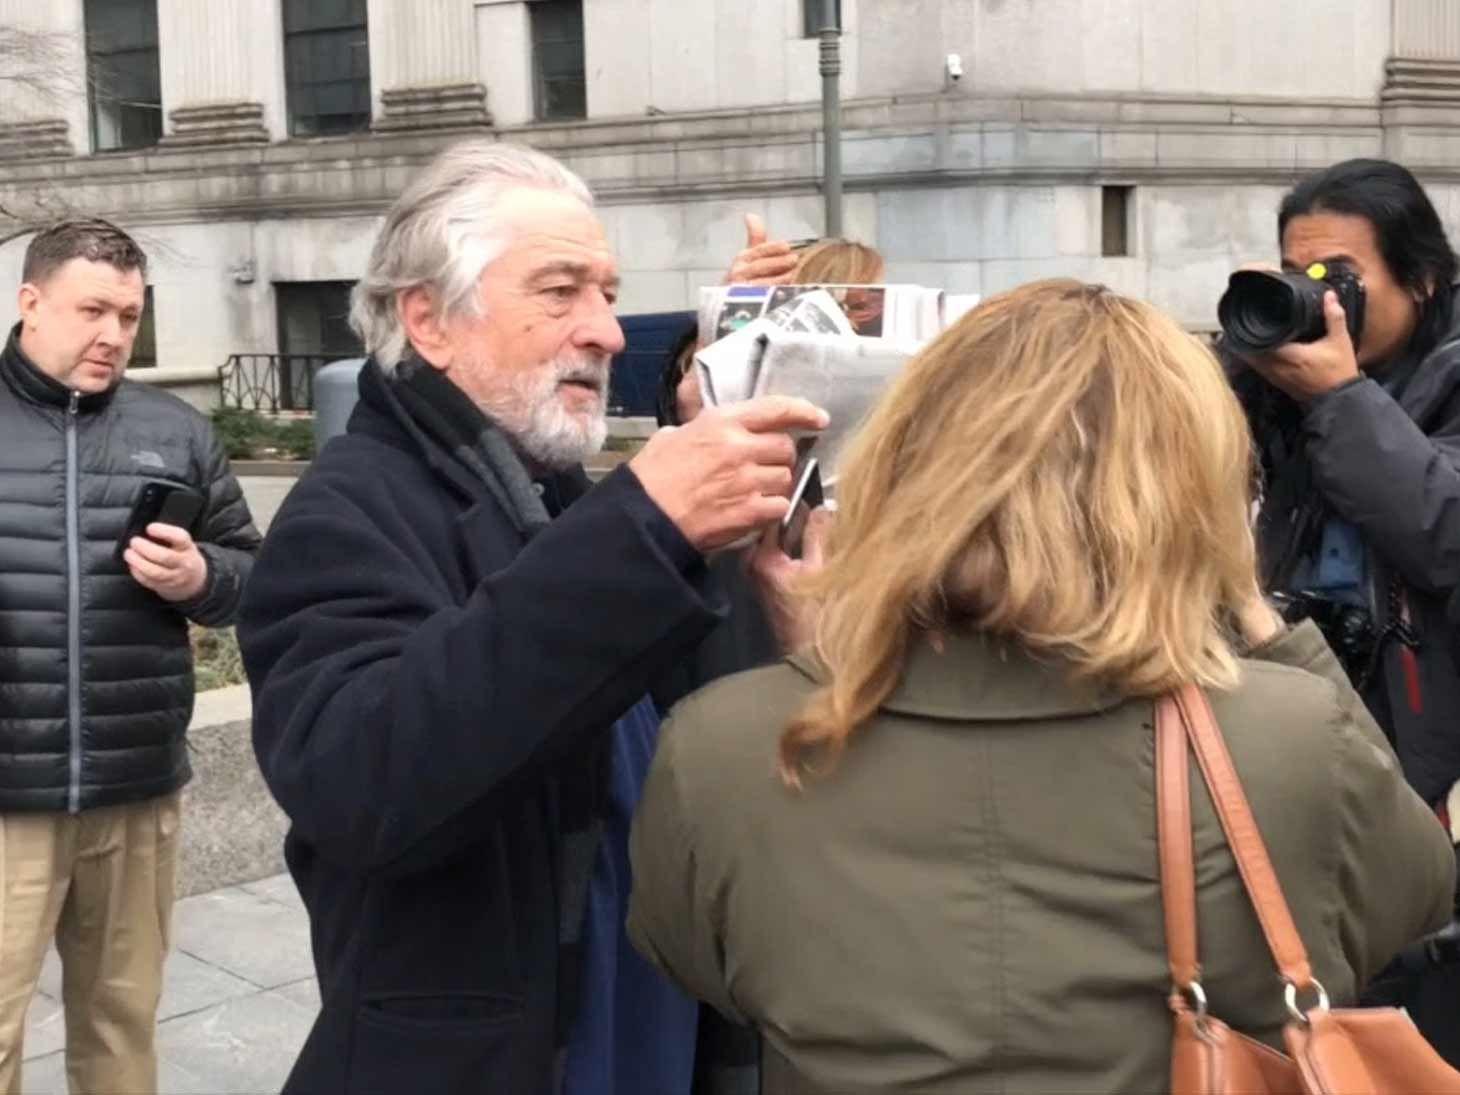 Robert De Niro Goes Off on Driver Outside of Divorce Court ...